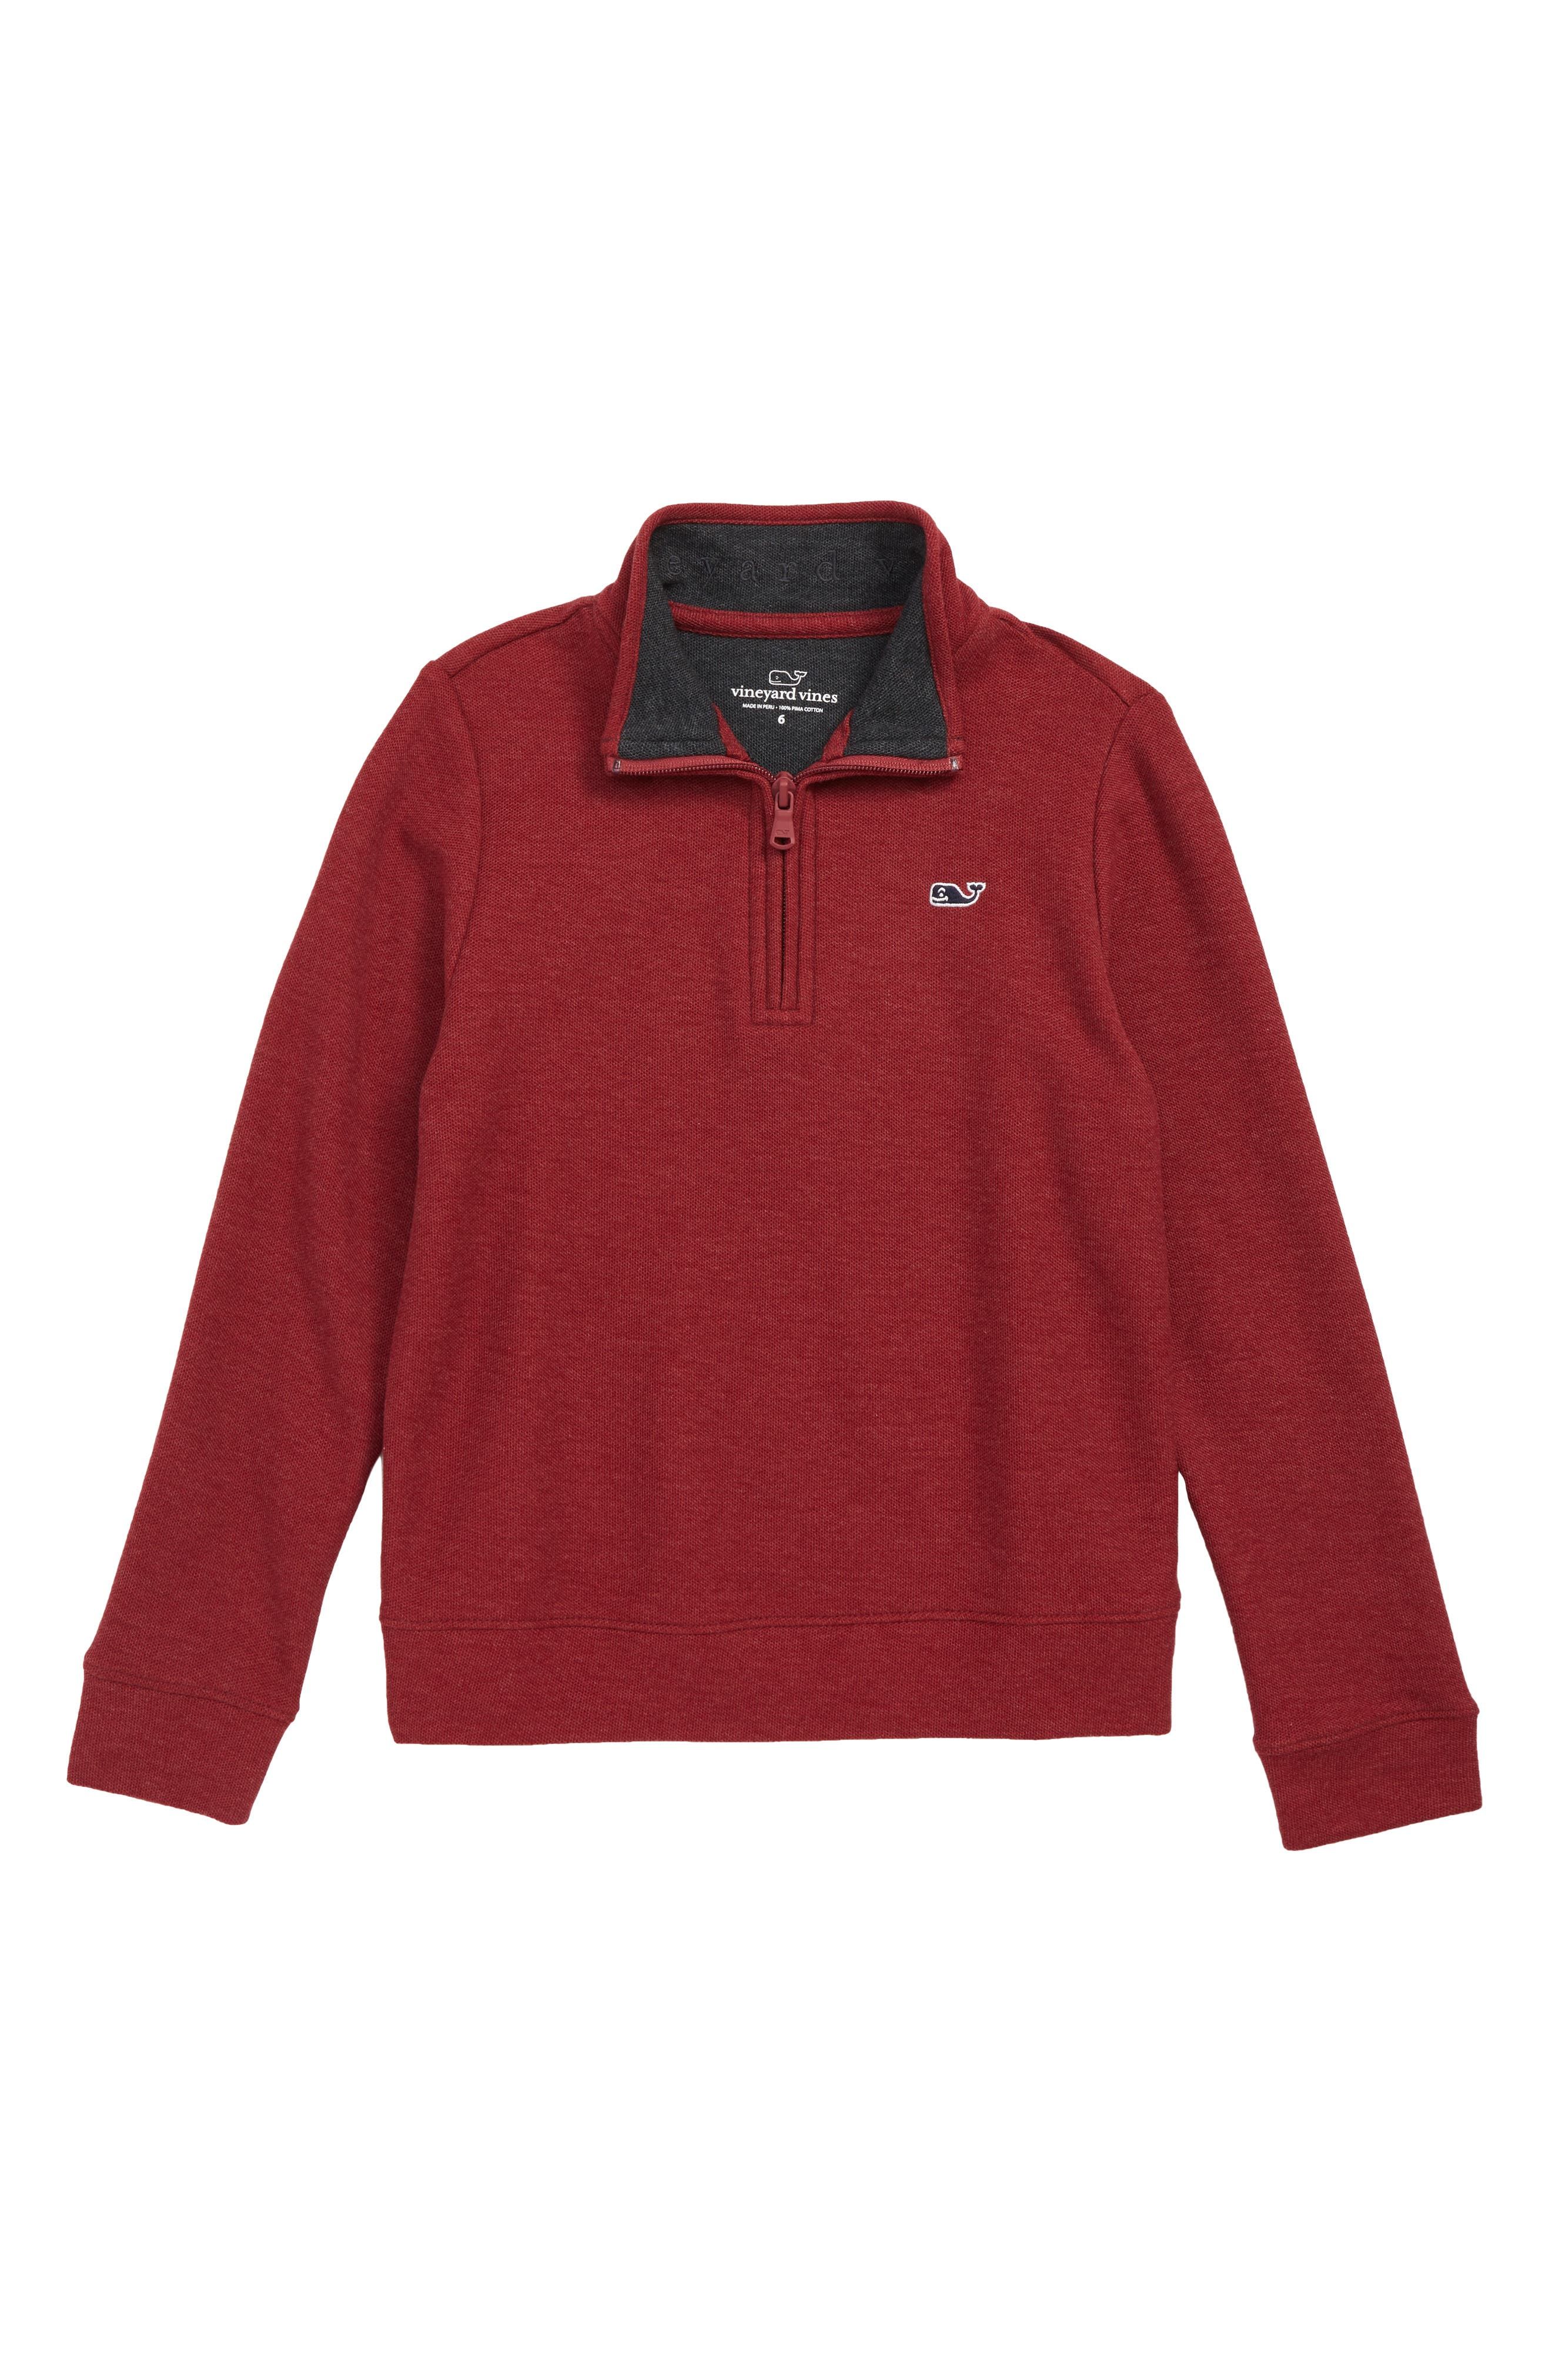 Quarter Zip Sweater,                         Main,                         color, 603